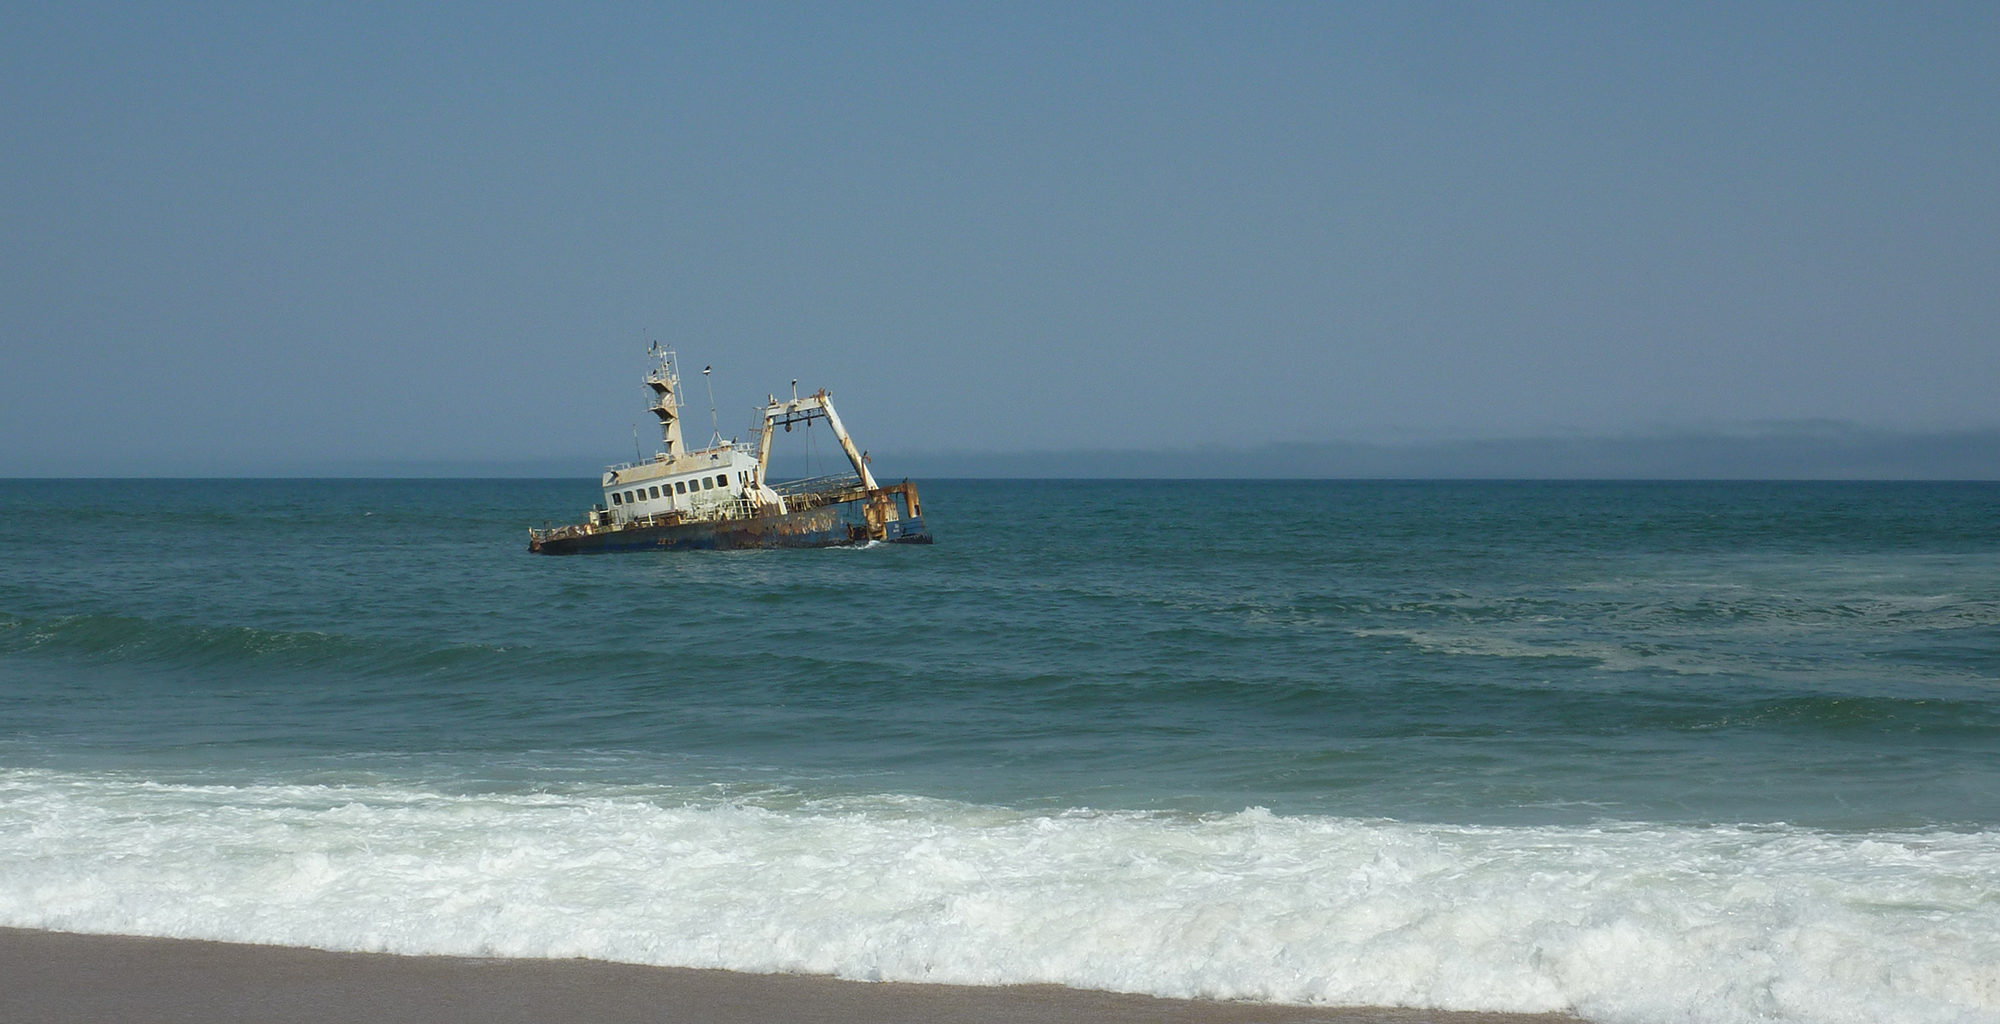 Namibia-Swakopmund-Boat